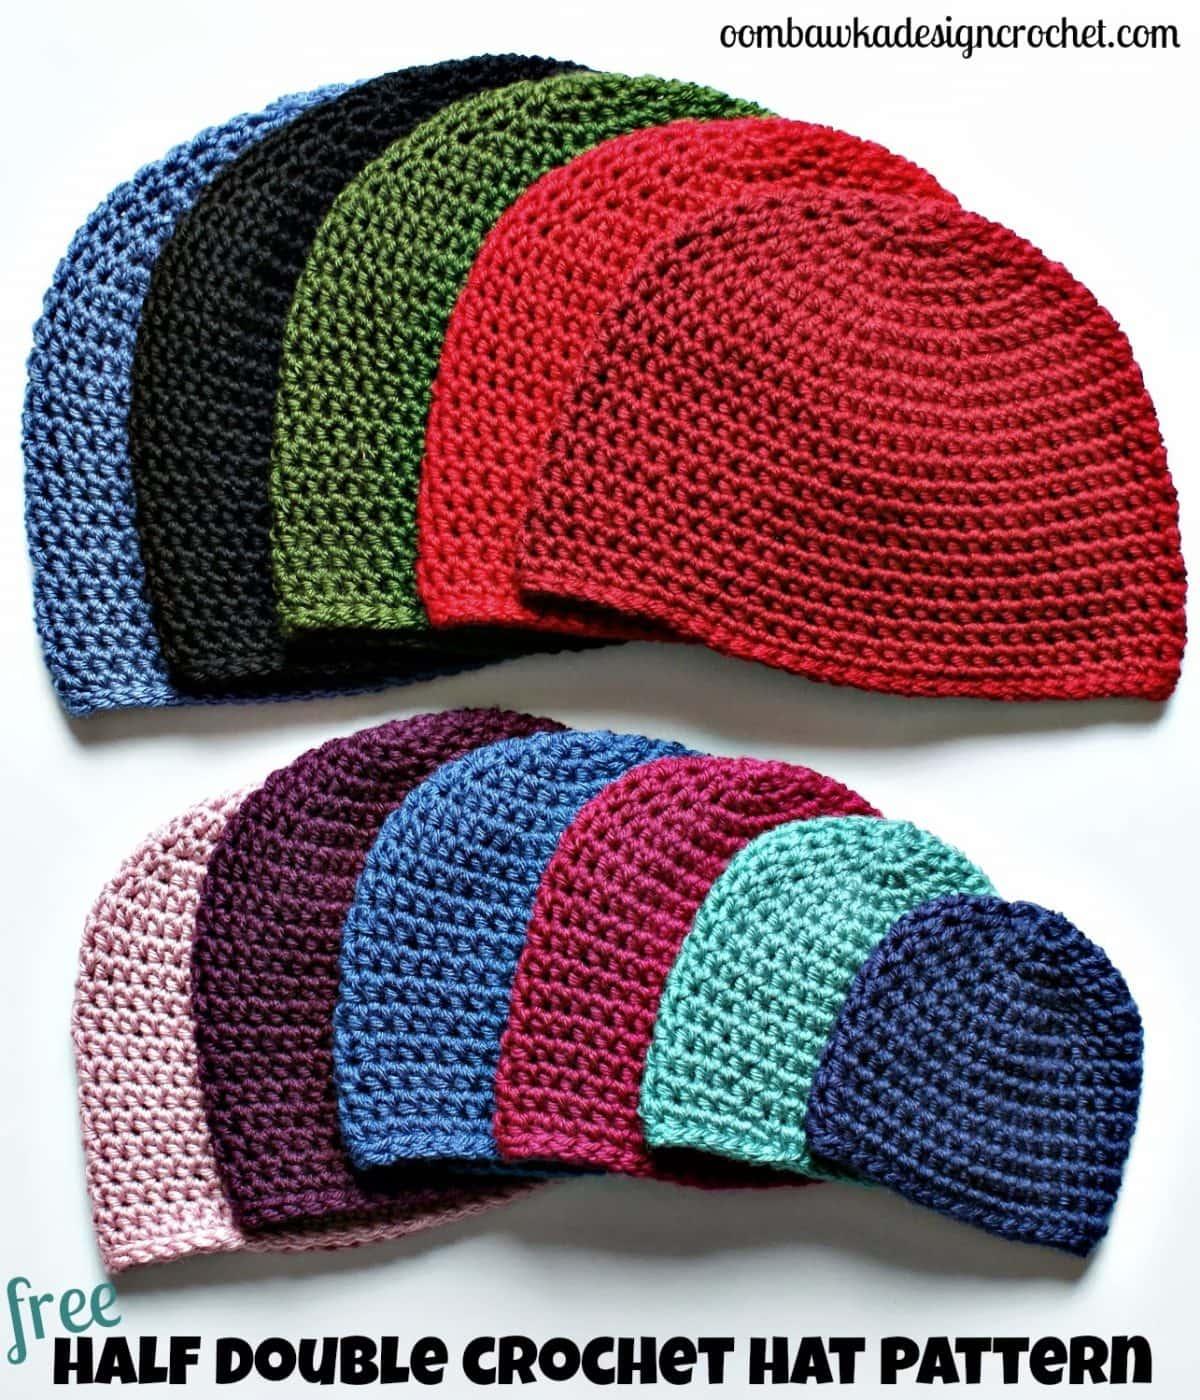 Half Double Crochet Hat Pattern. • Oombawka Design Crochet